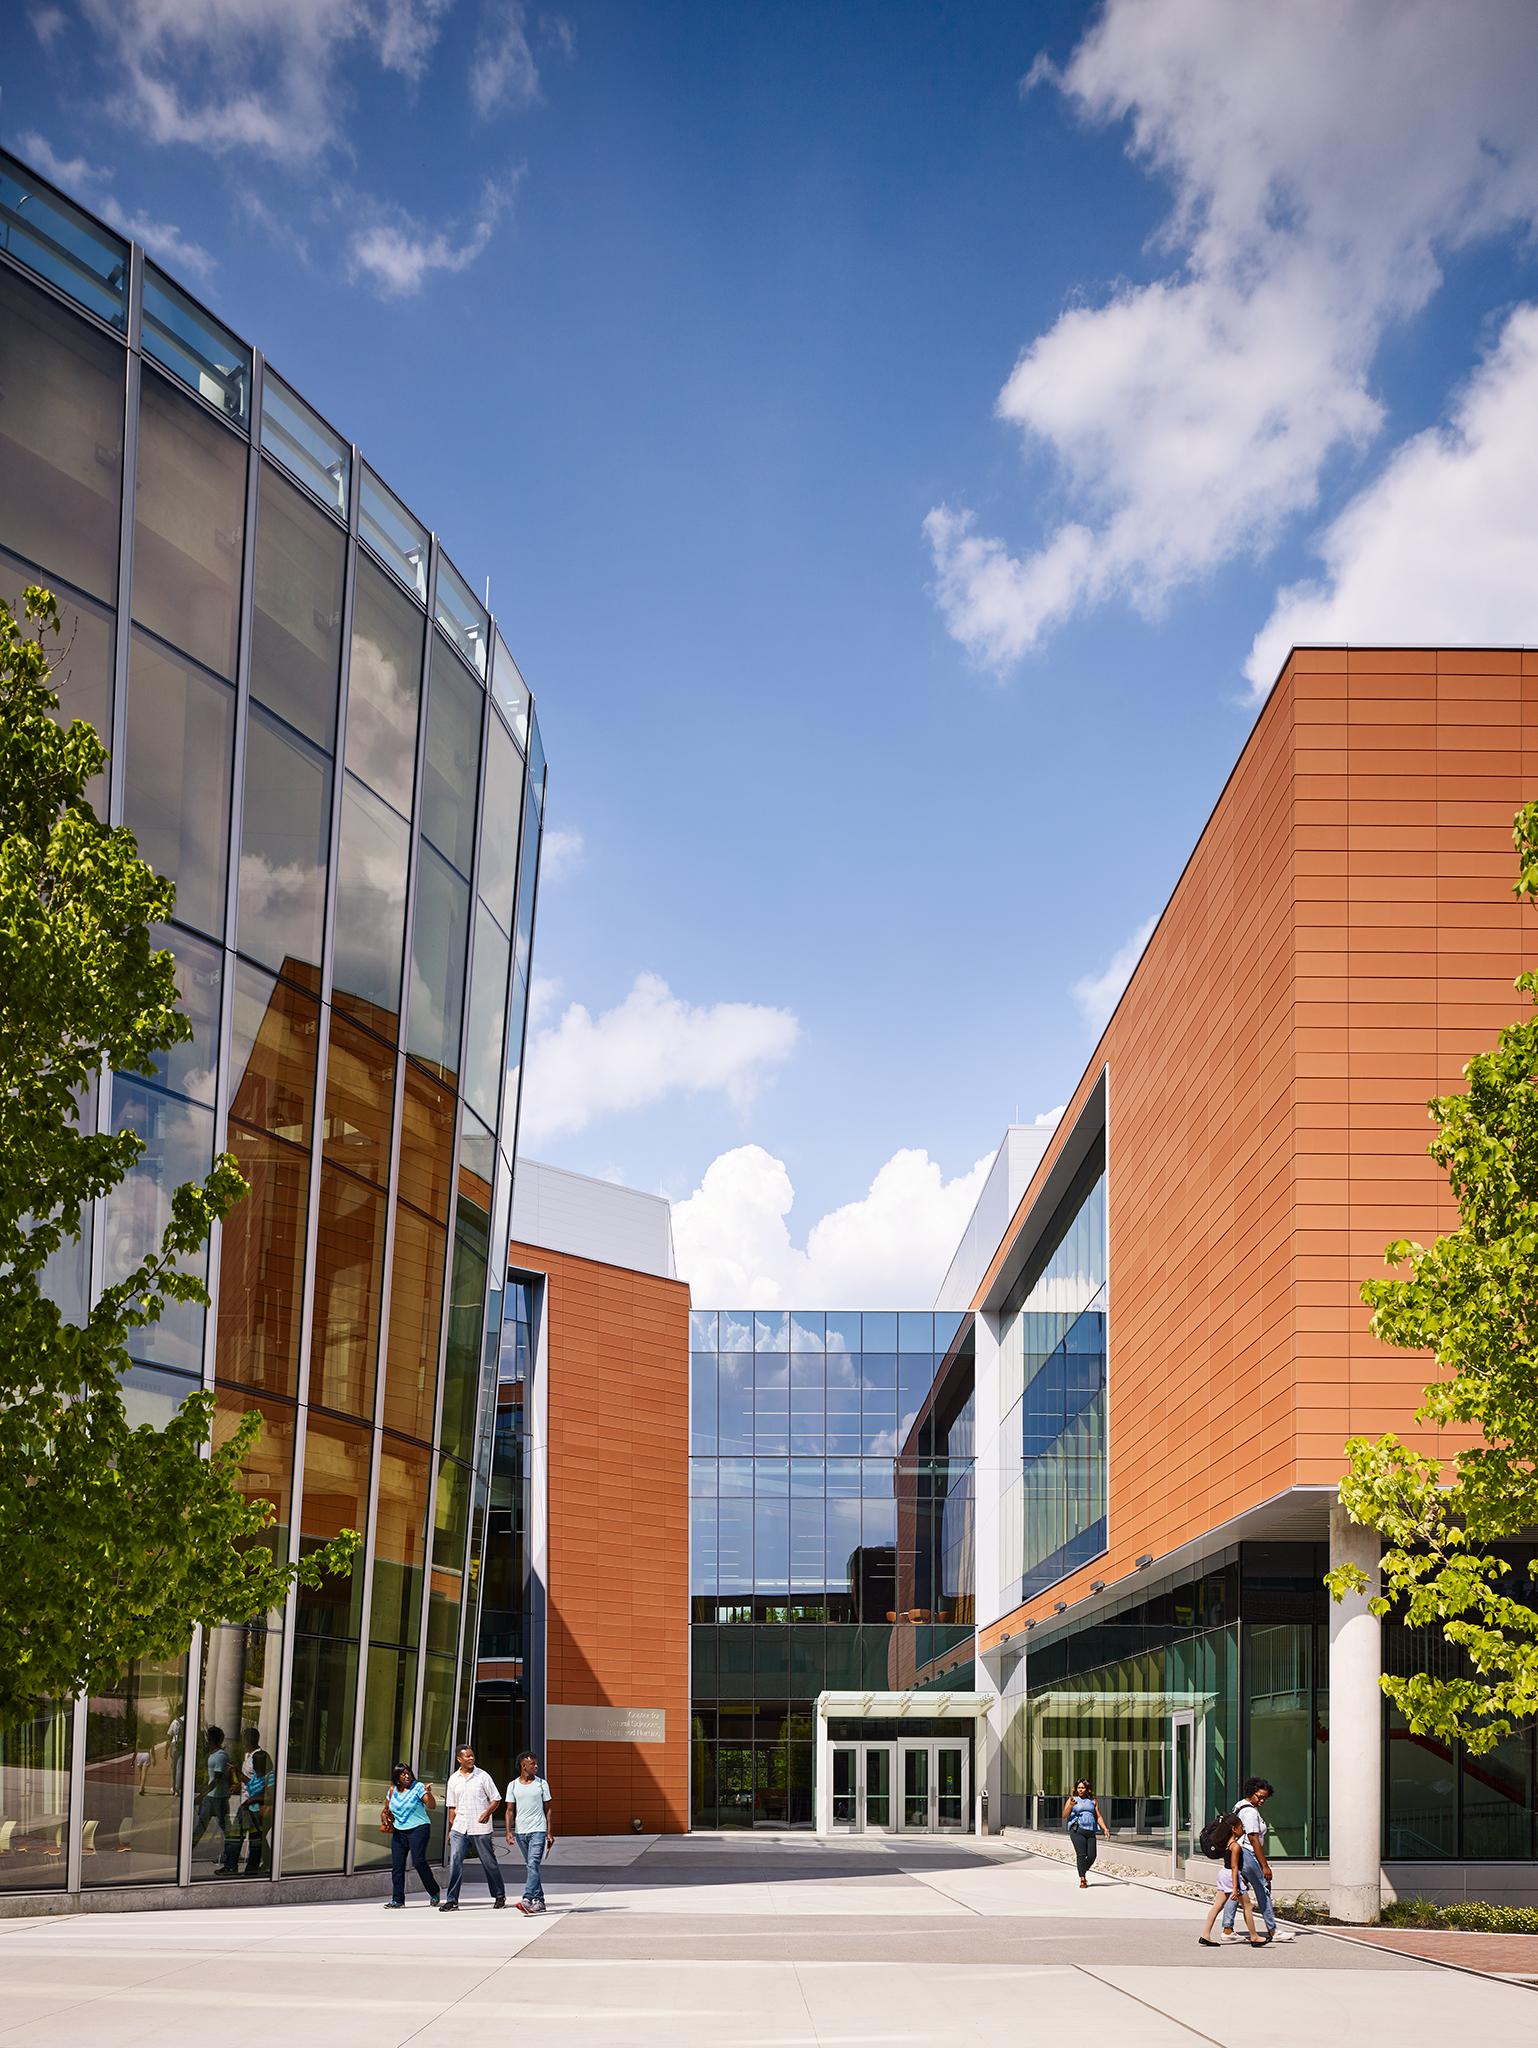 Bowie State University, Center for Natural Sciences, Mathematics + Nursing